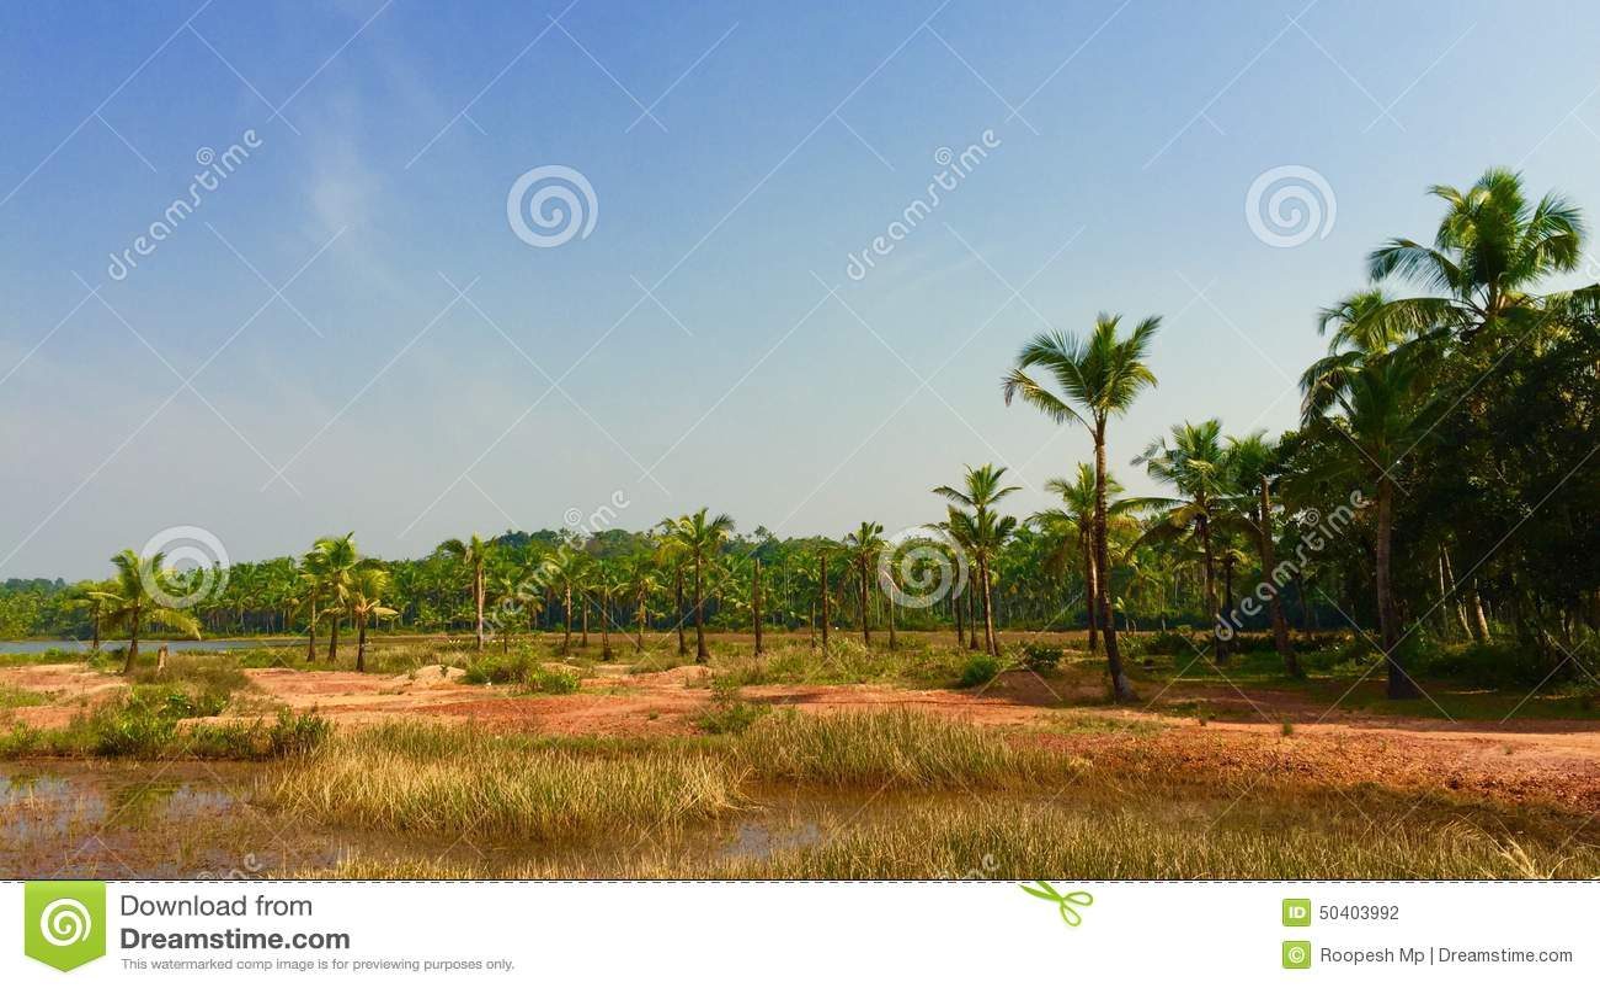 Coconuts Landscape Stock Photo - Image: 50403992